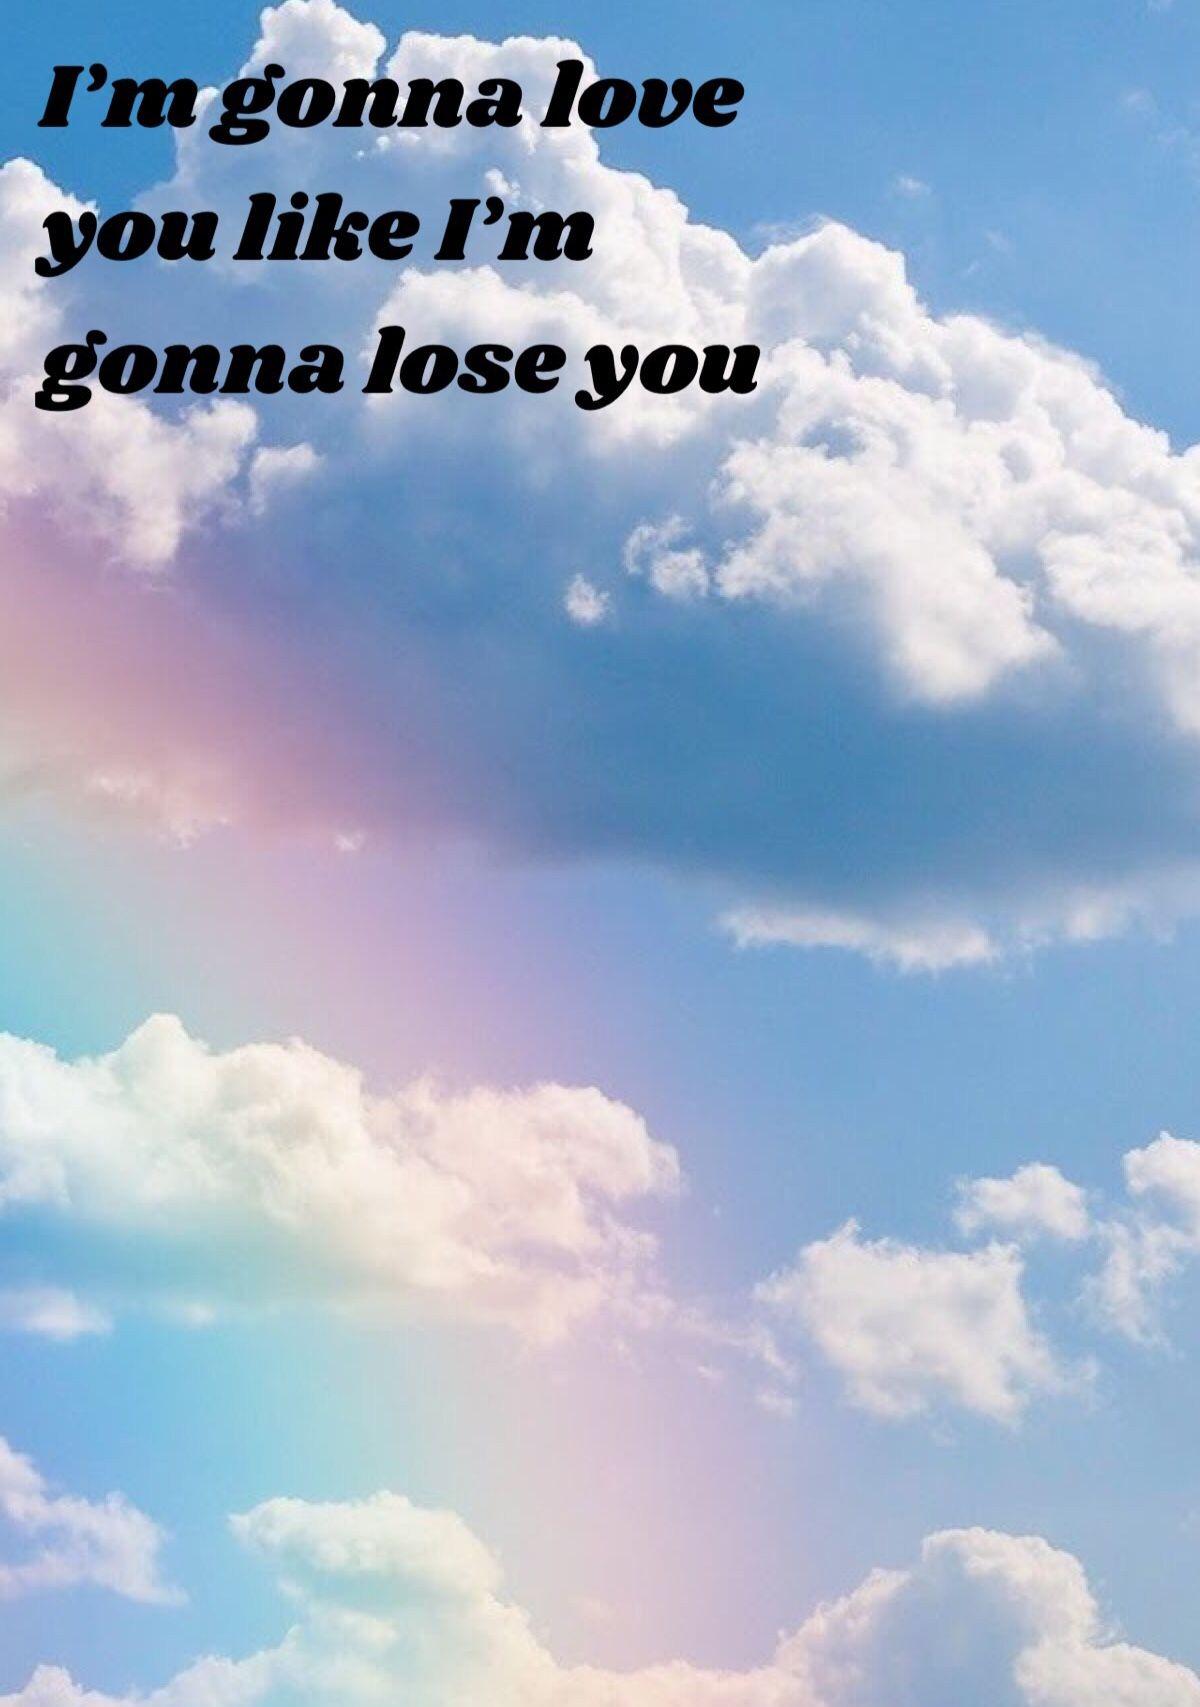 Popular Song Lyrics 2018 Tumblr Modern L Y R I C S Pinterest